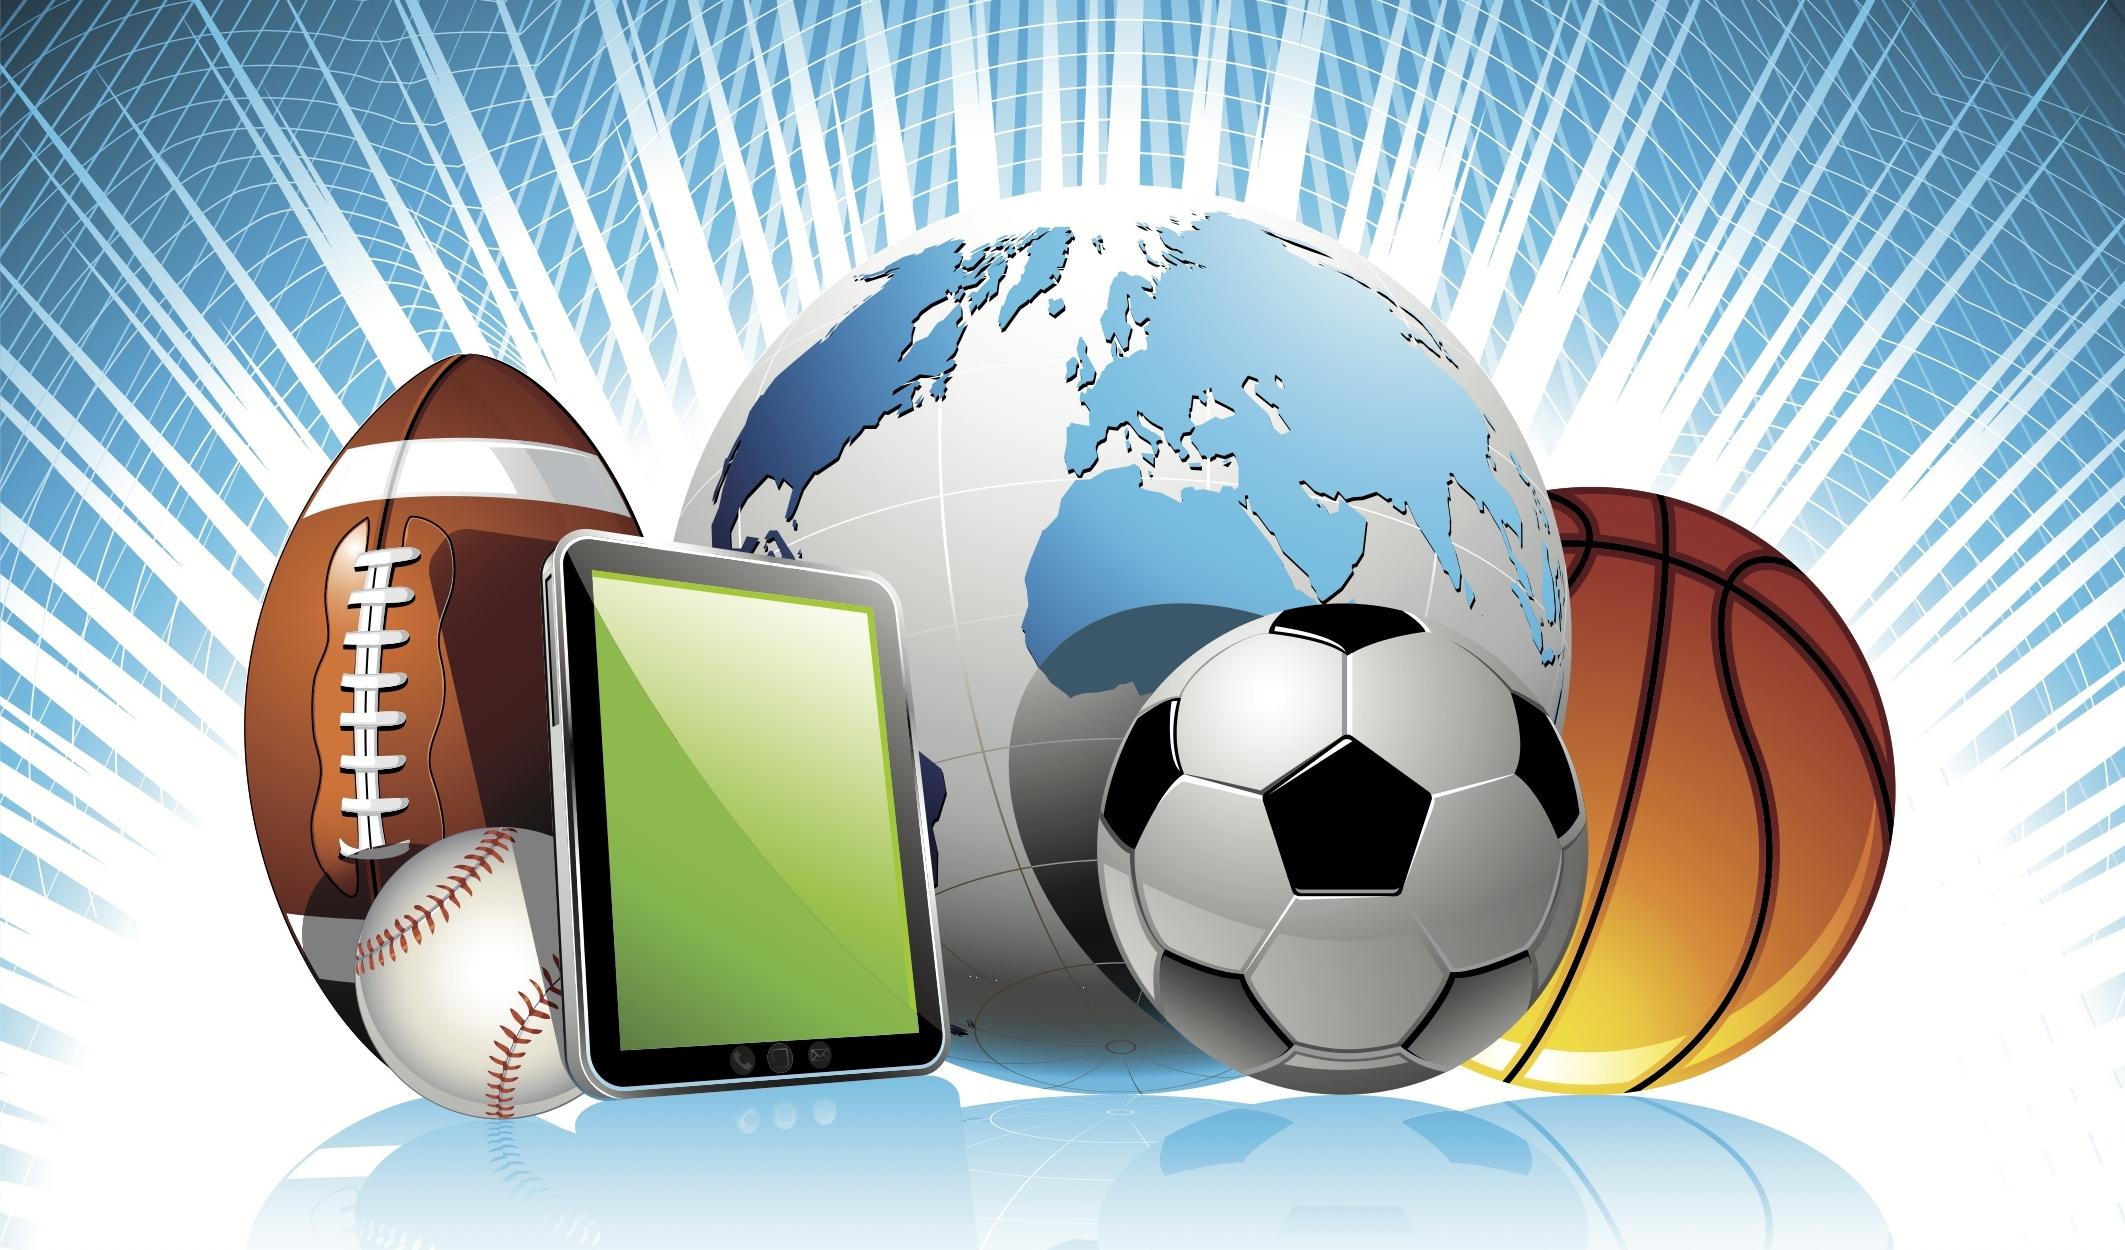 teknologi untuk olahraga